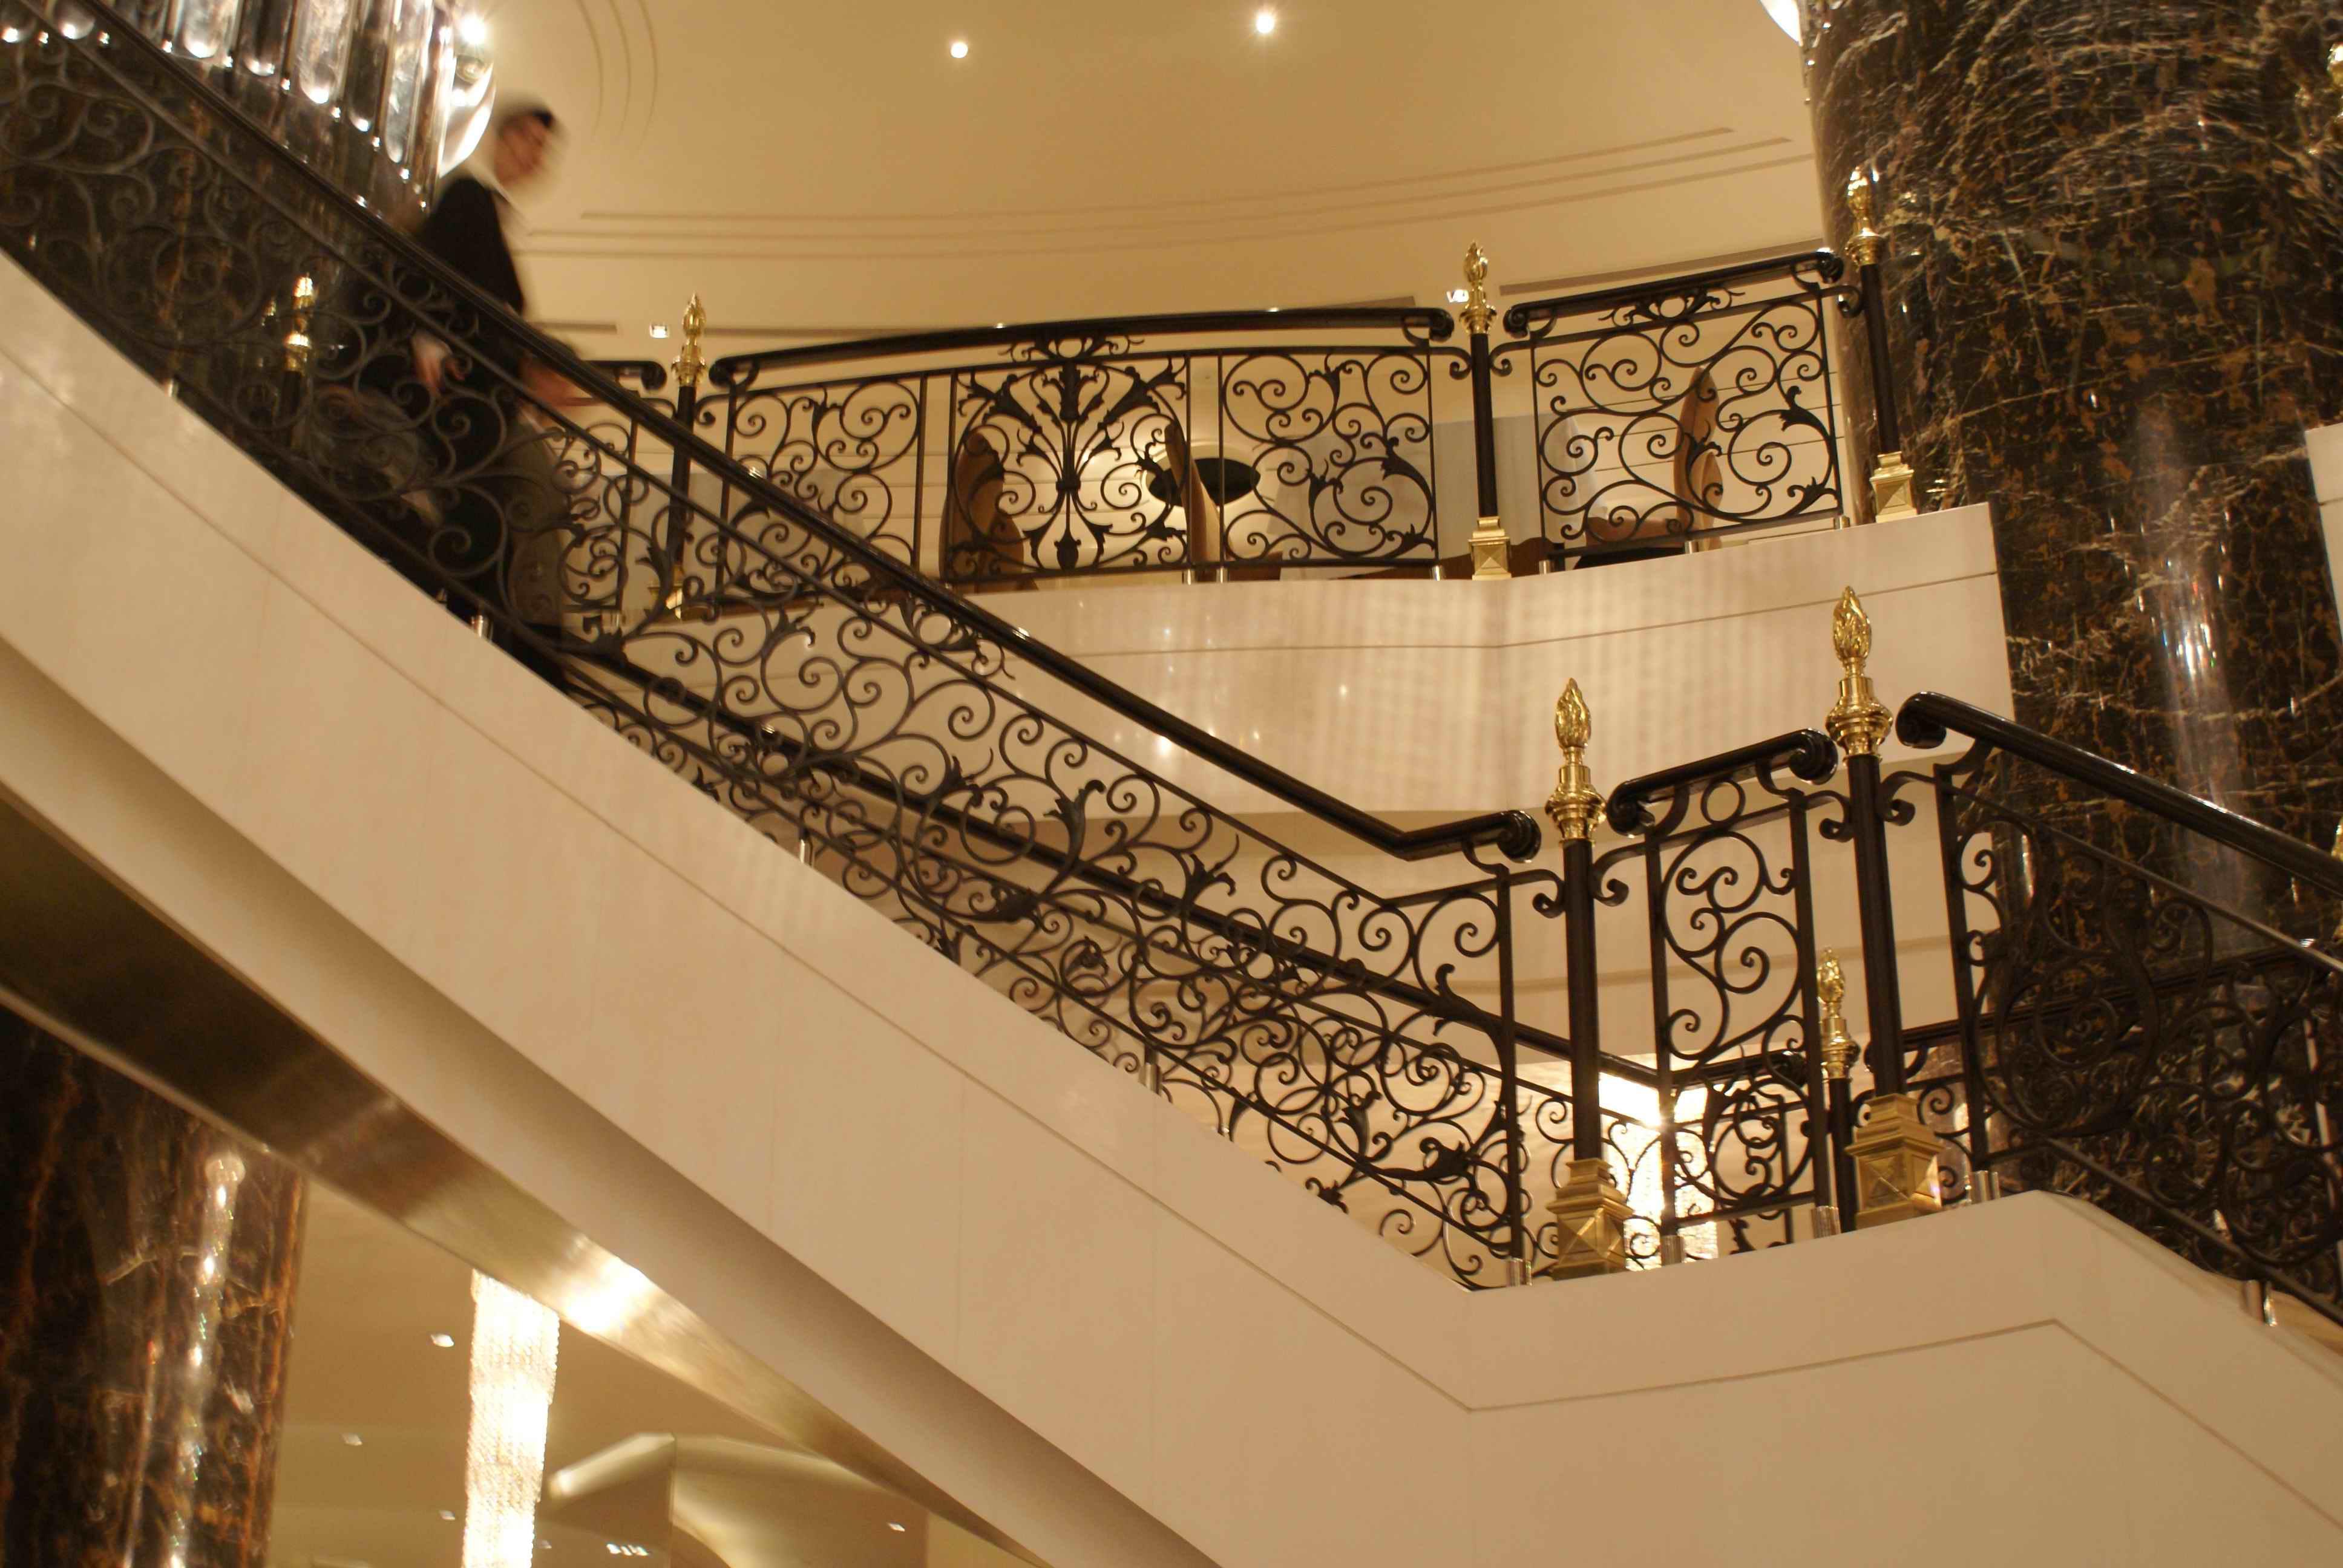 Hench Wrought Iron Balustrade/indoor Wrought Iron Stair Railing Design